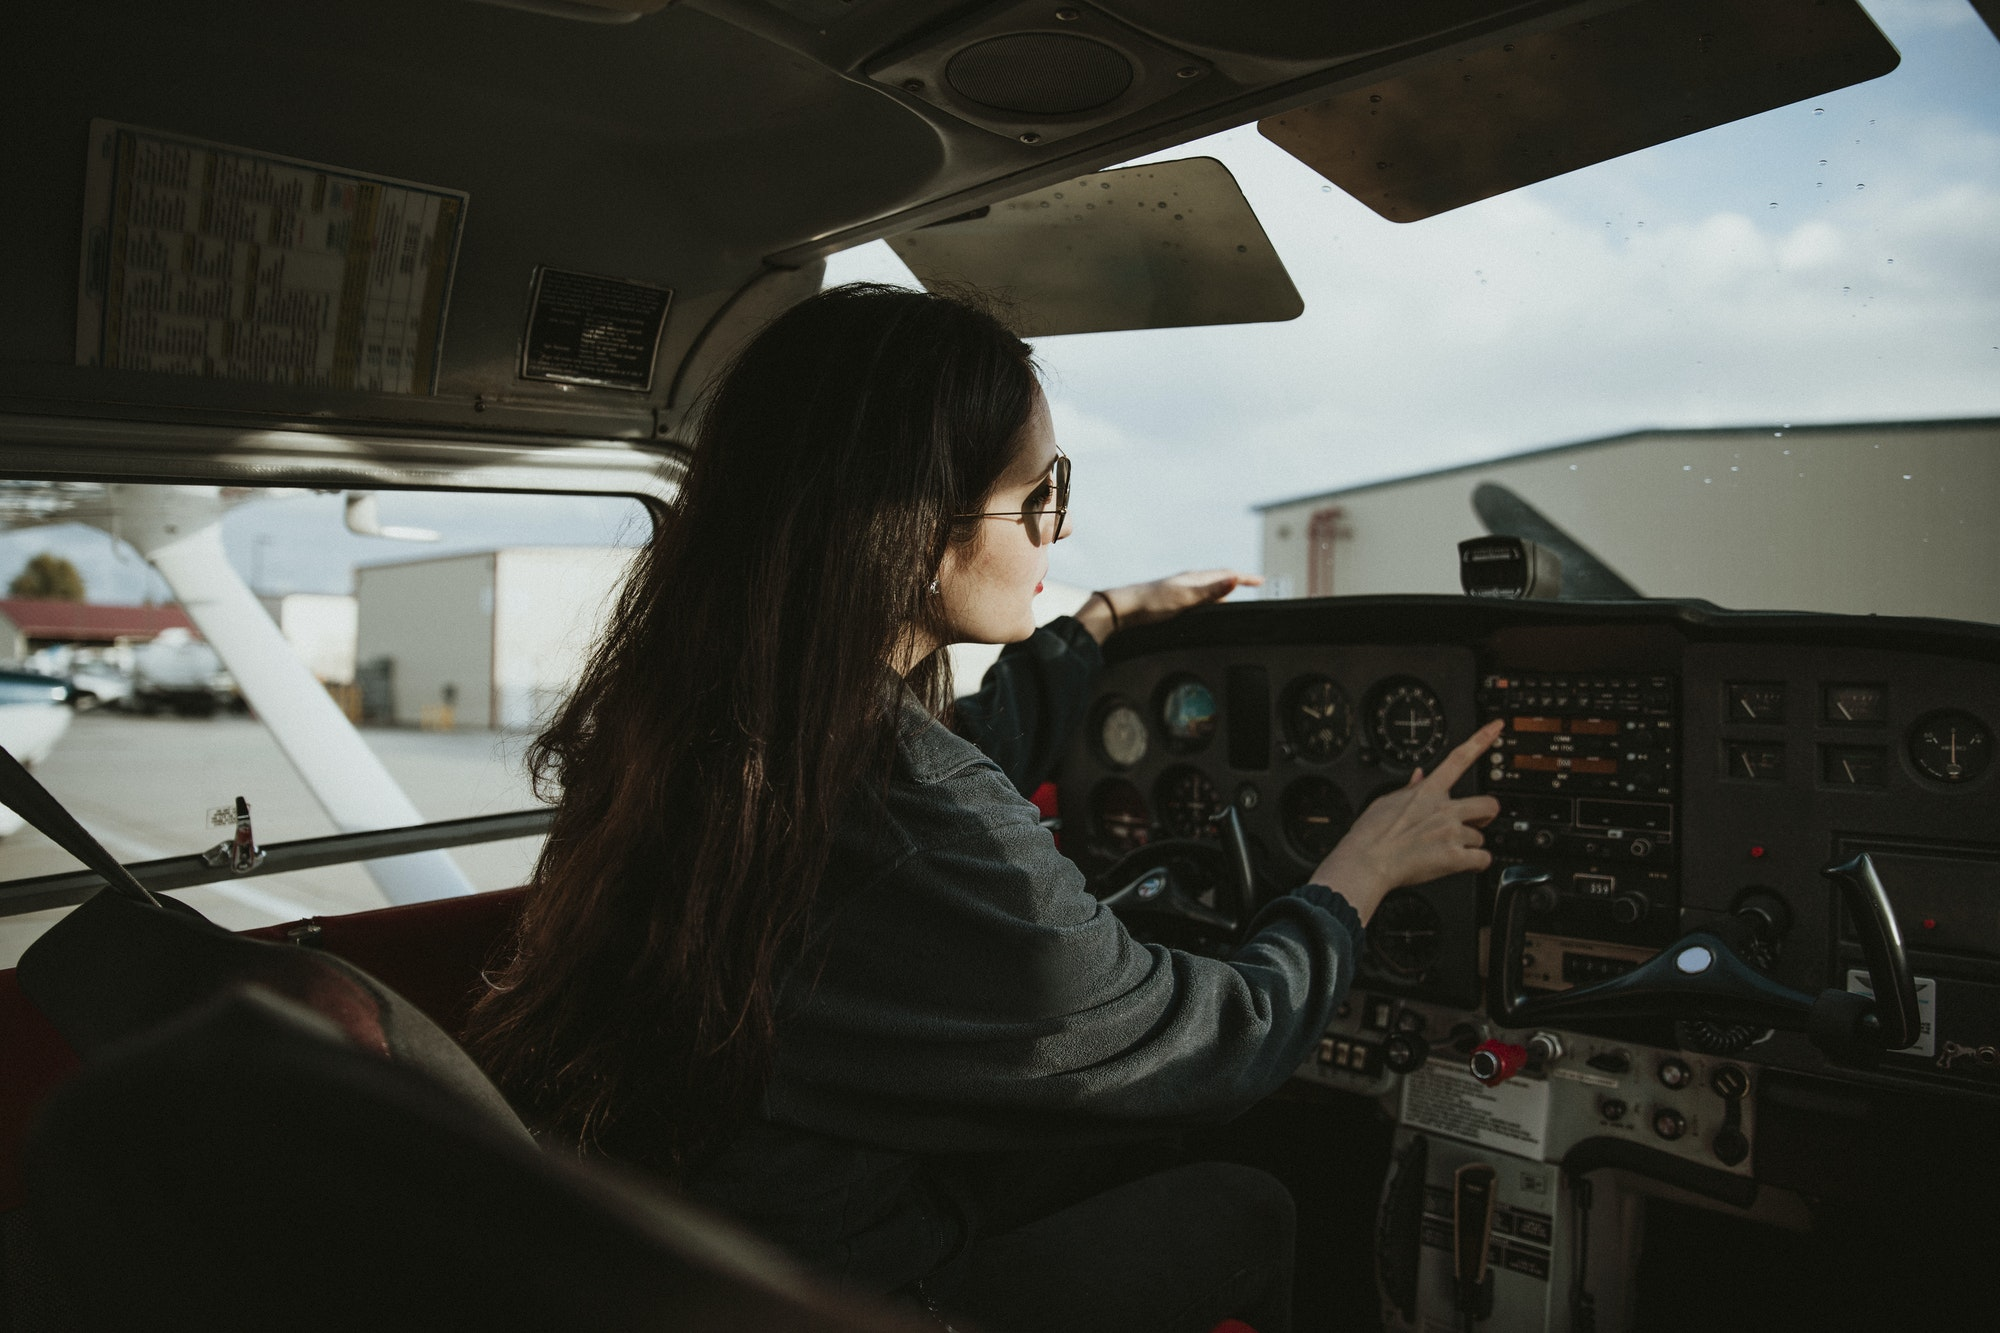 Professional female aviator